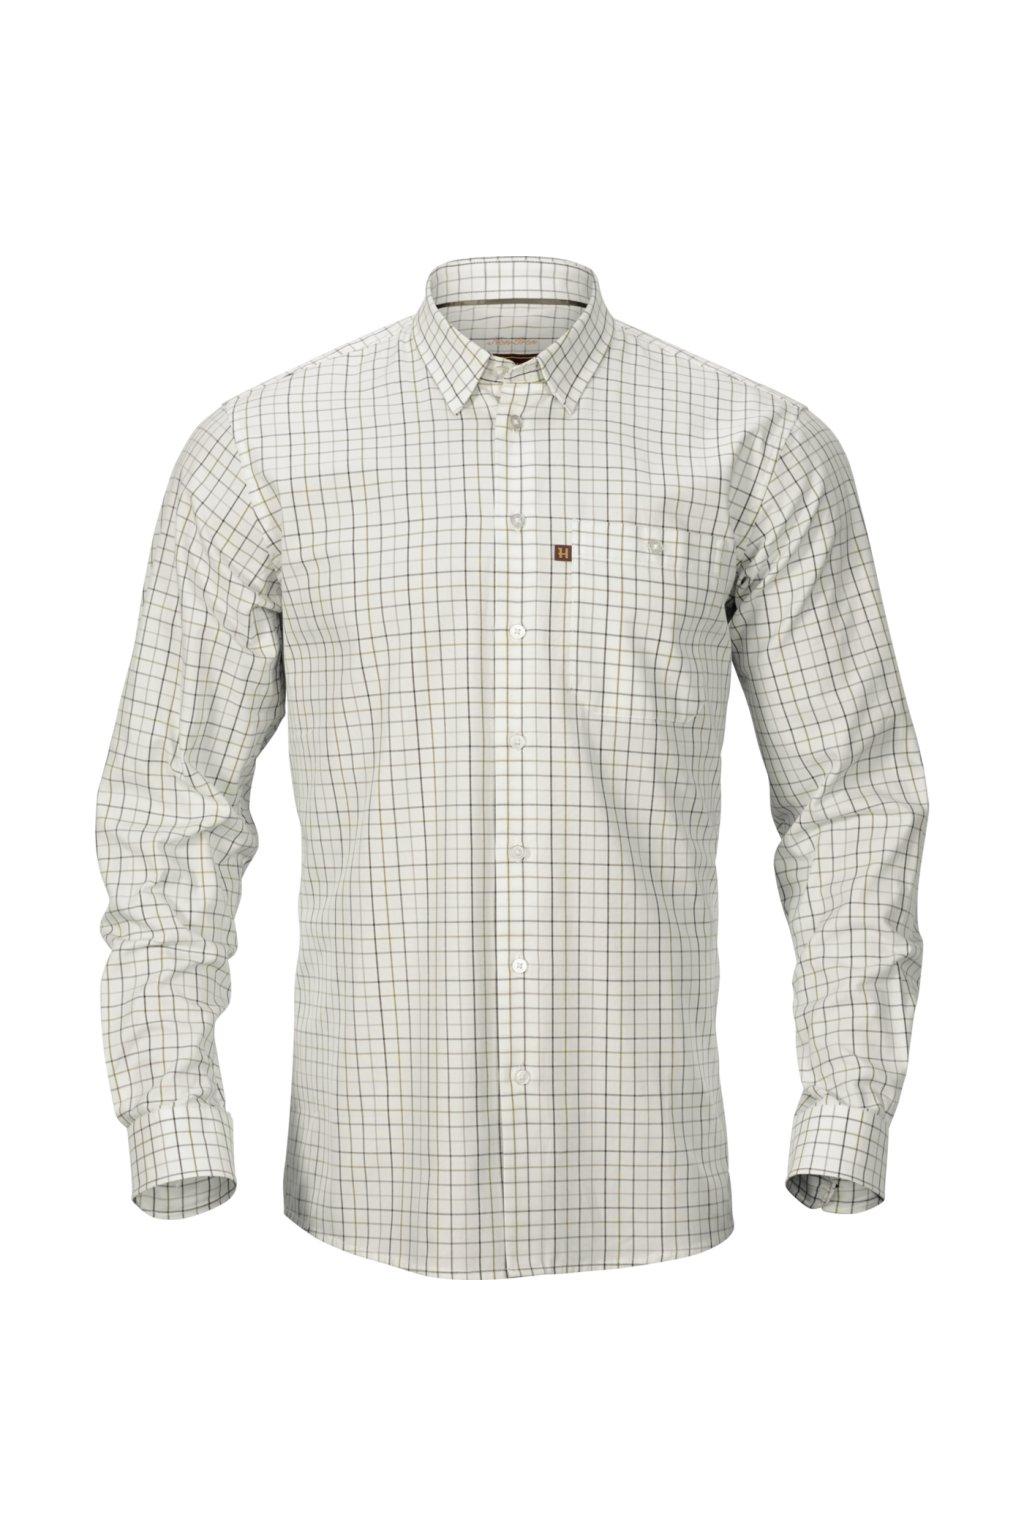 HÄRKILA - Retrieve košile pánská s dl.rukávem